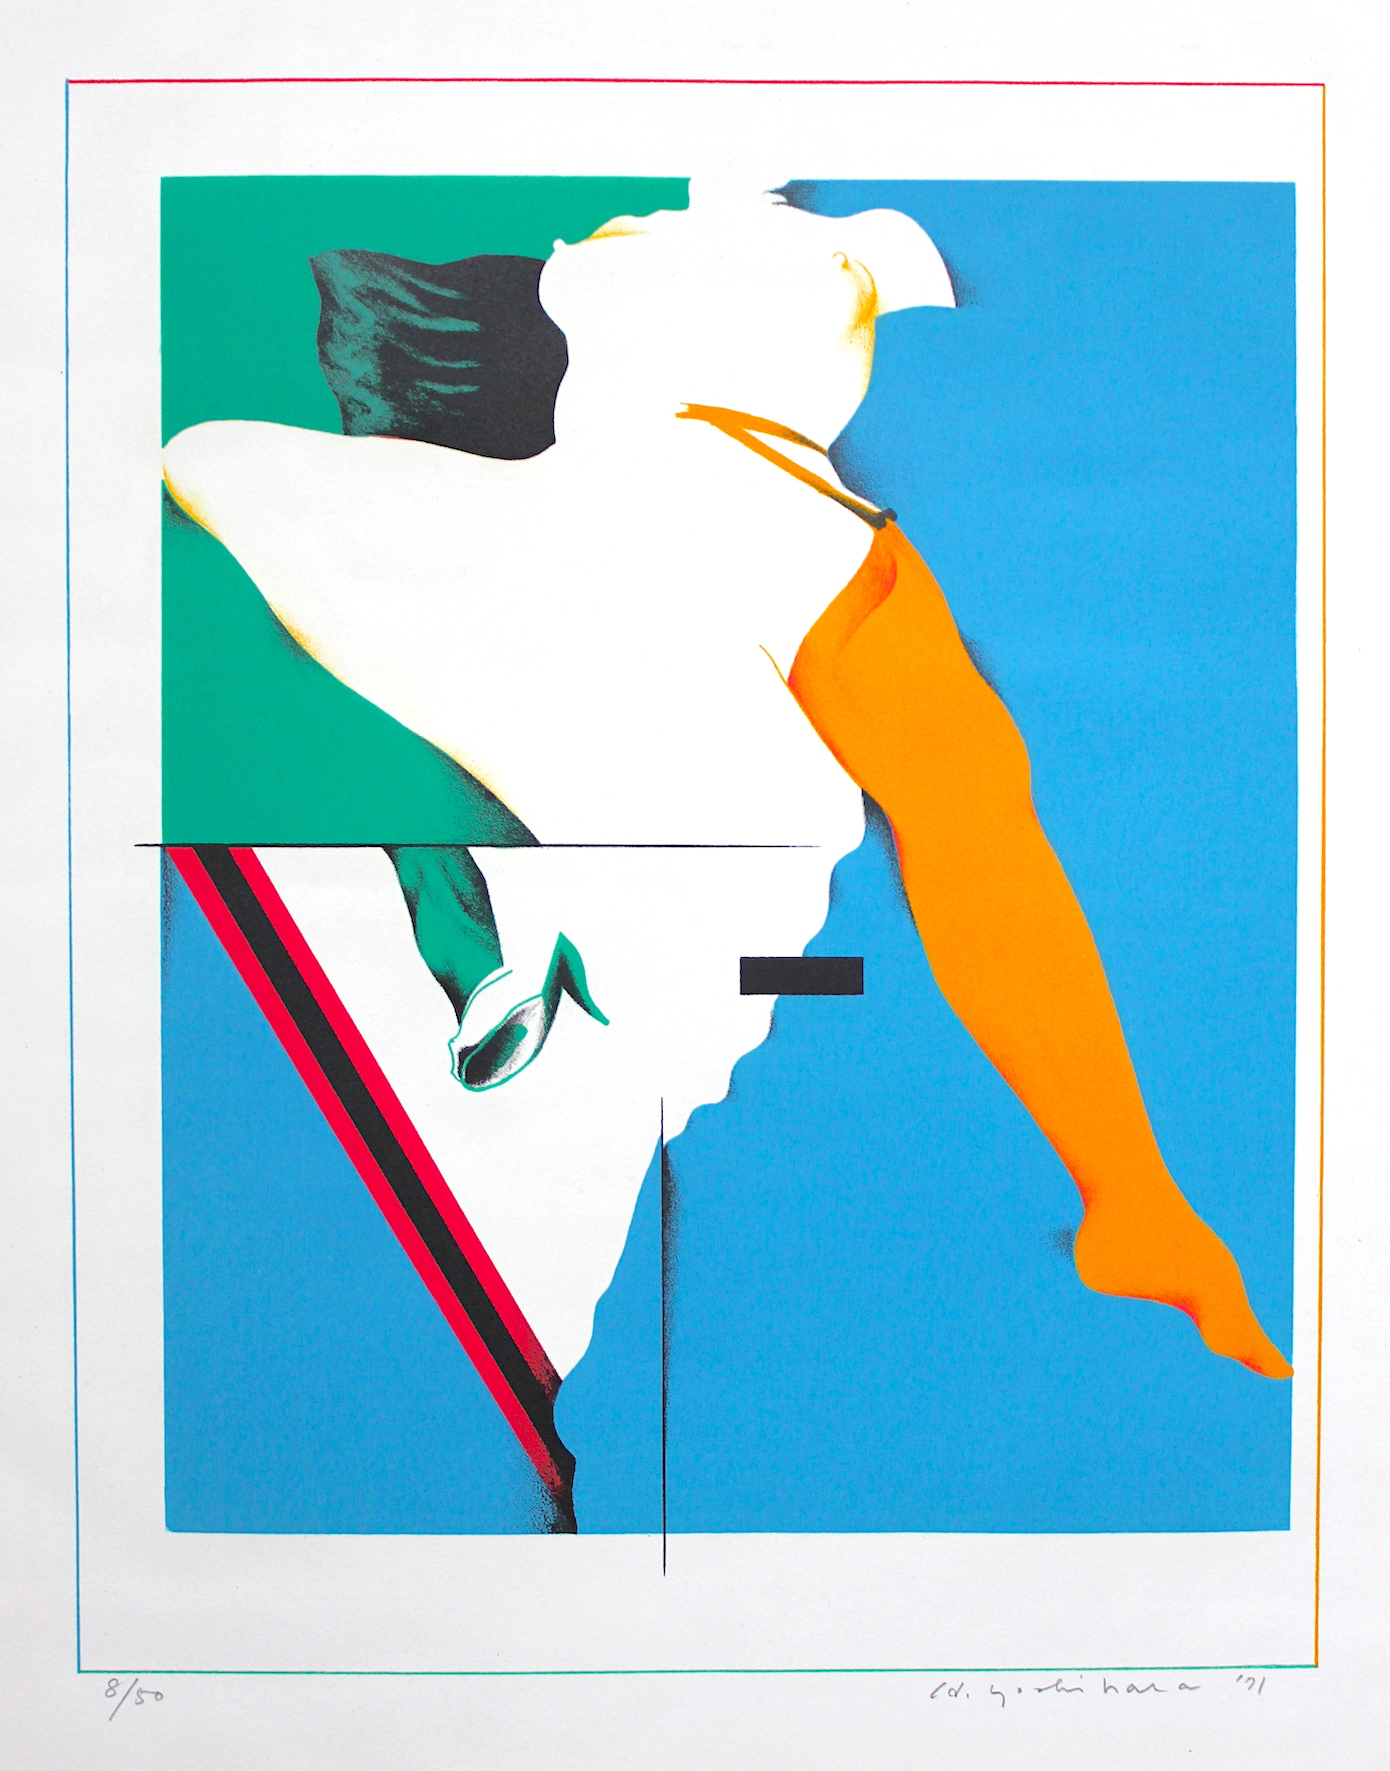 Hideo  Yoshihara /  吉原英雄 クッション リトグラフ、紙 1971年